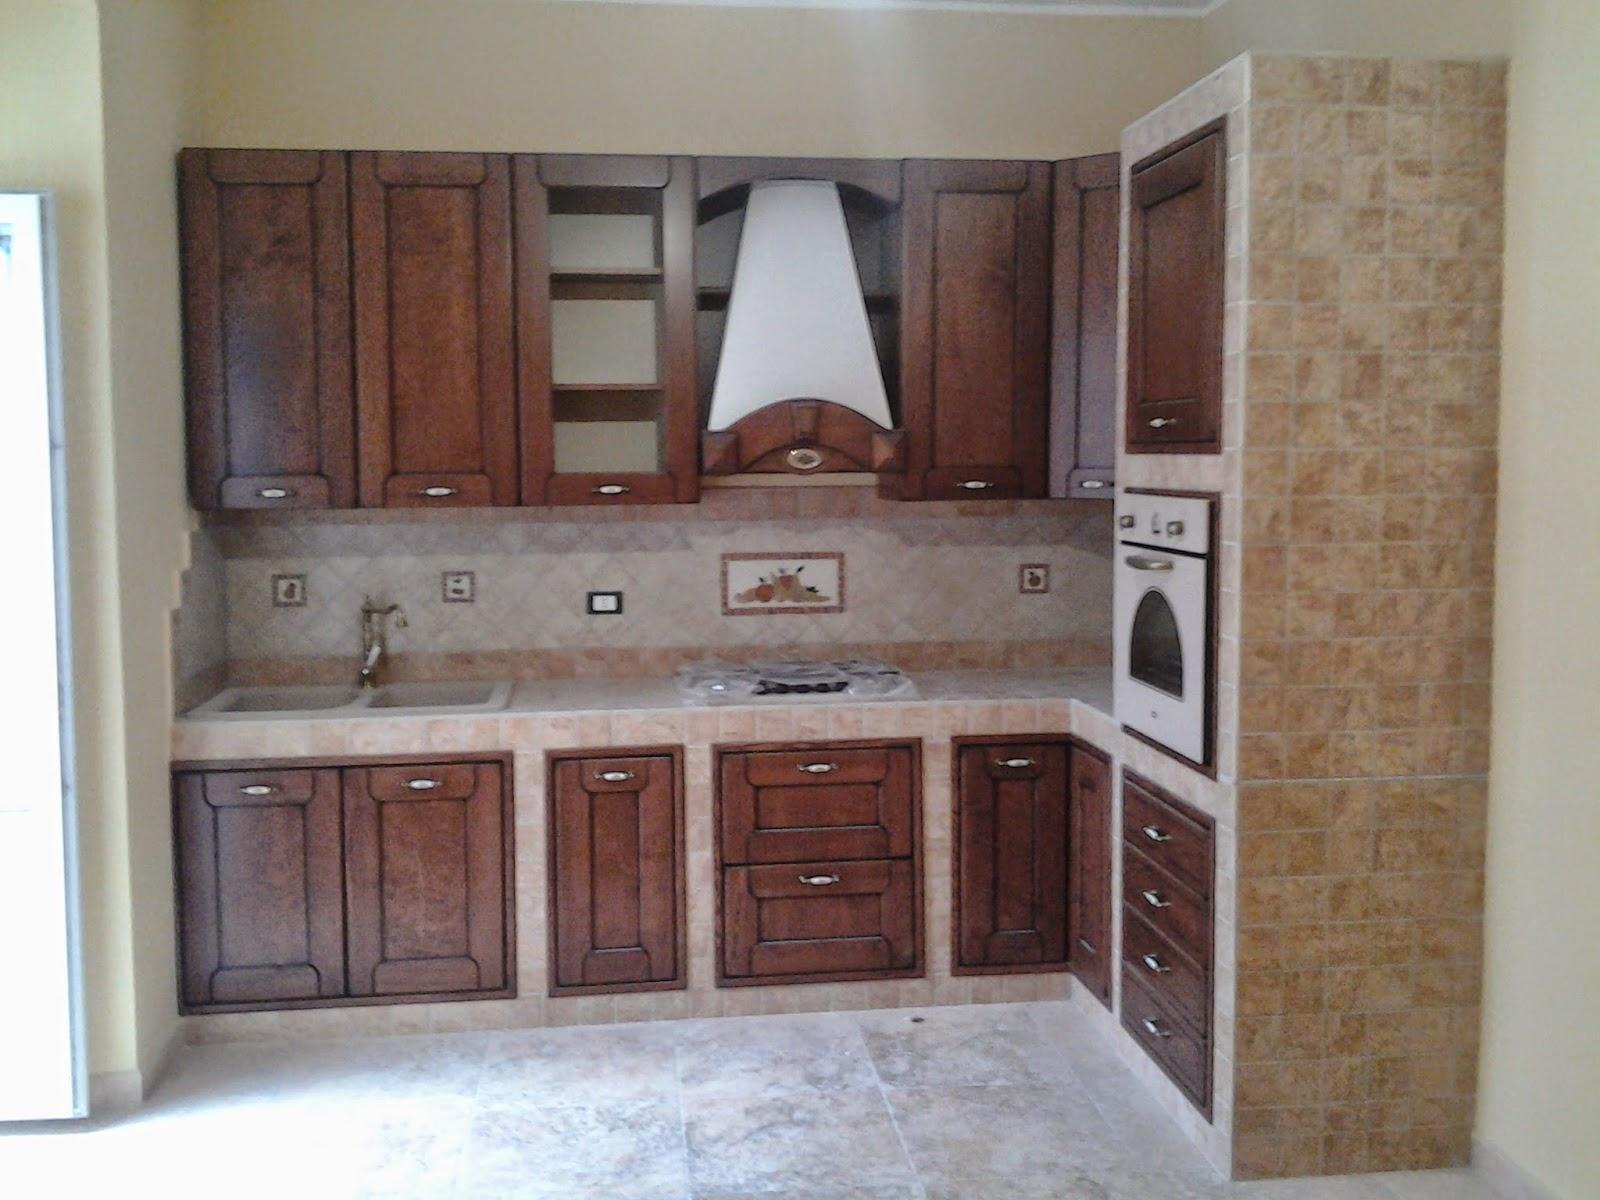 Architetto gaetano frud cucina in muratura for Cucine in murature